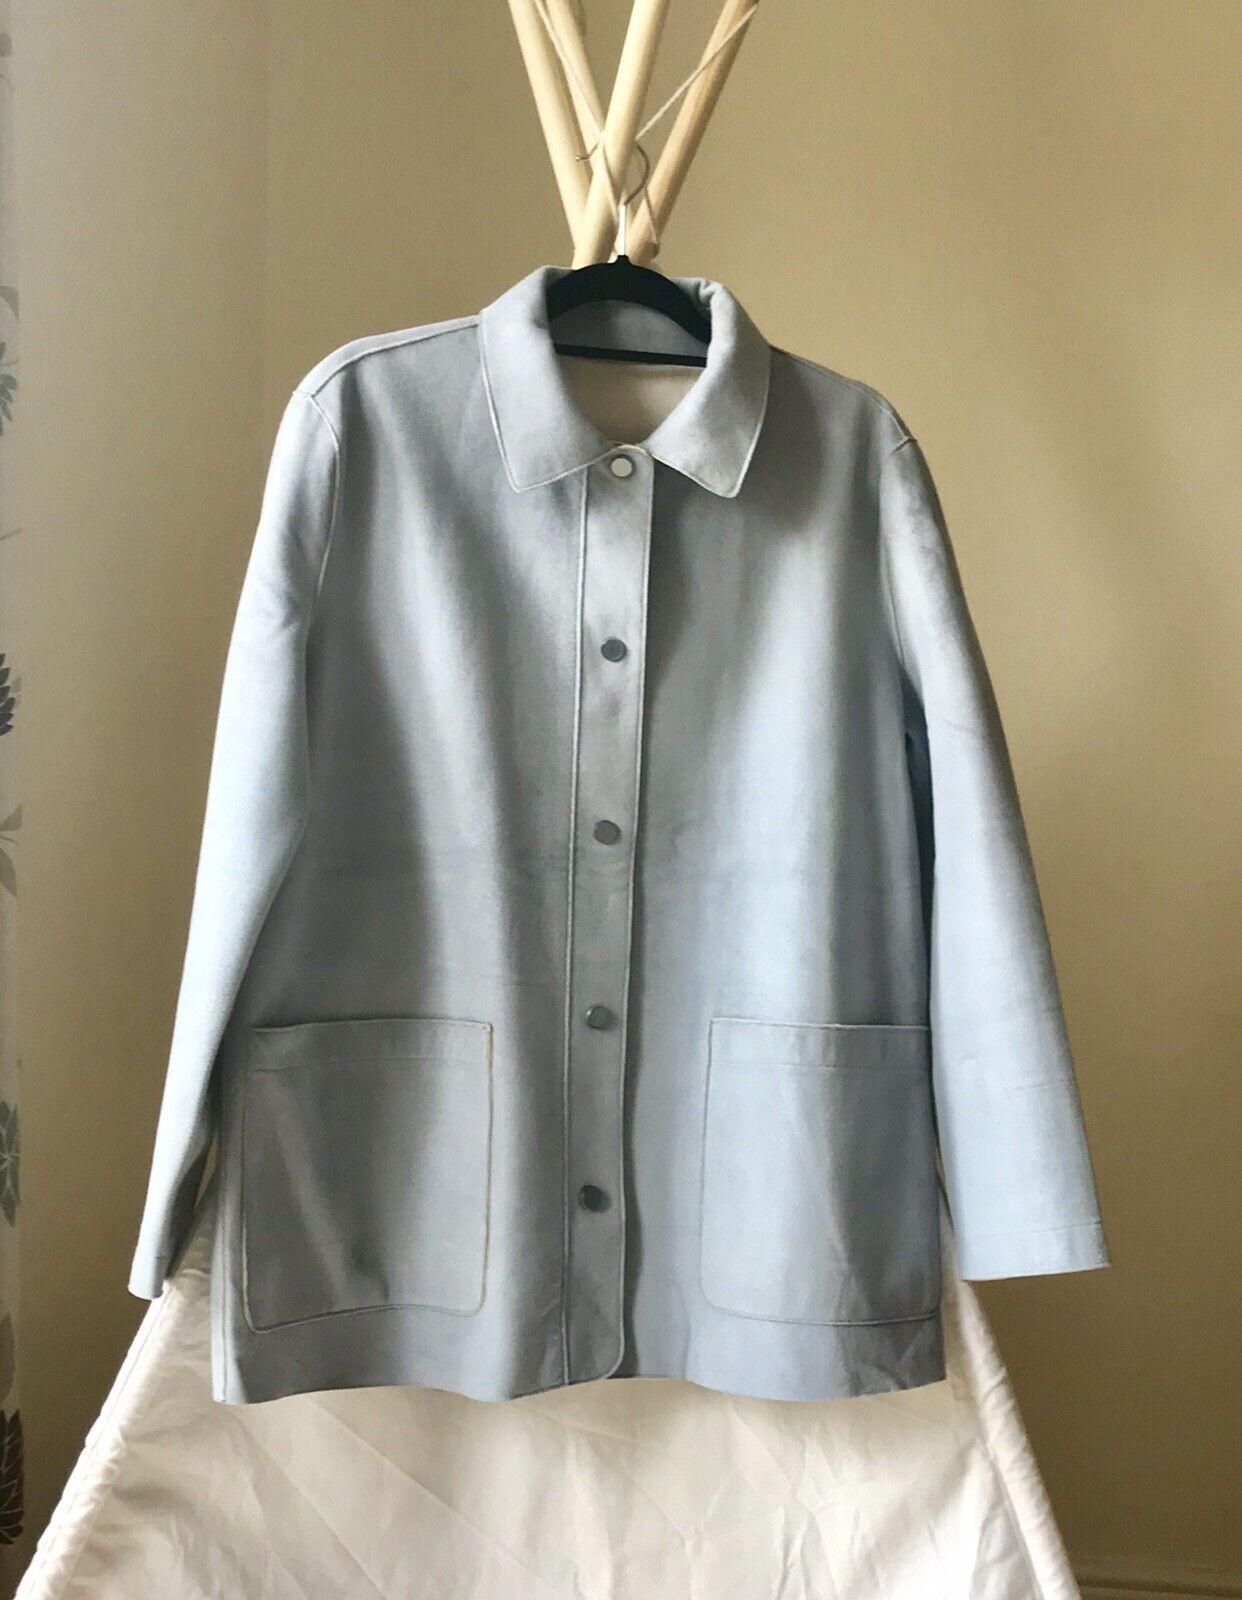 Betty Barclay Faux Suede Dove Blue Jacket Coat Size 12 Excellent Condition